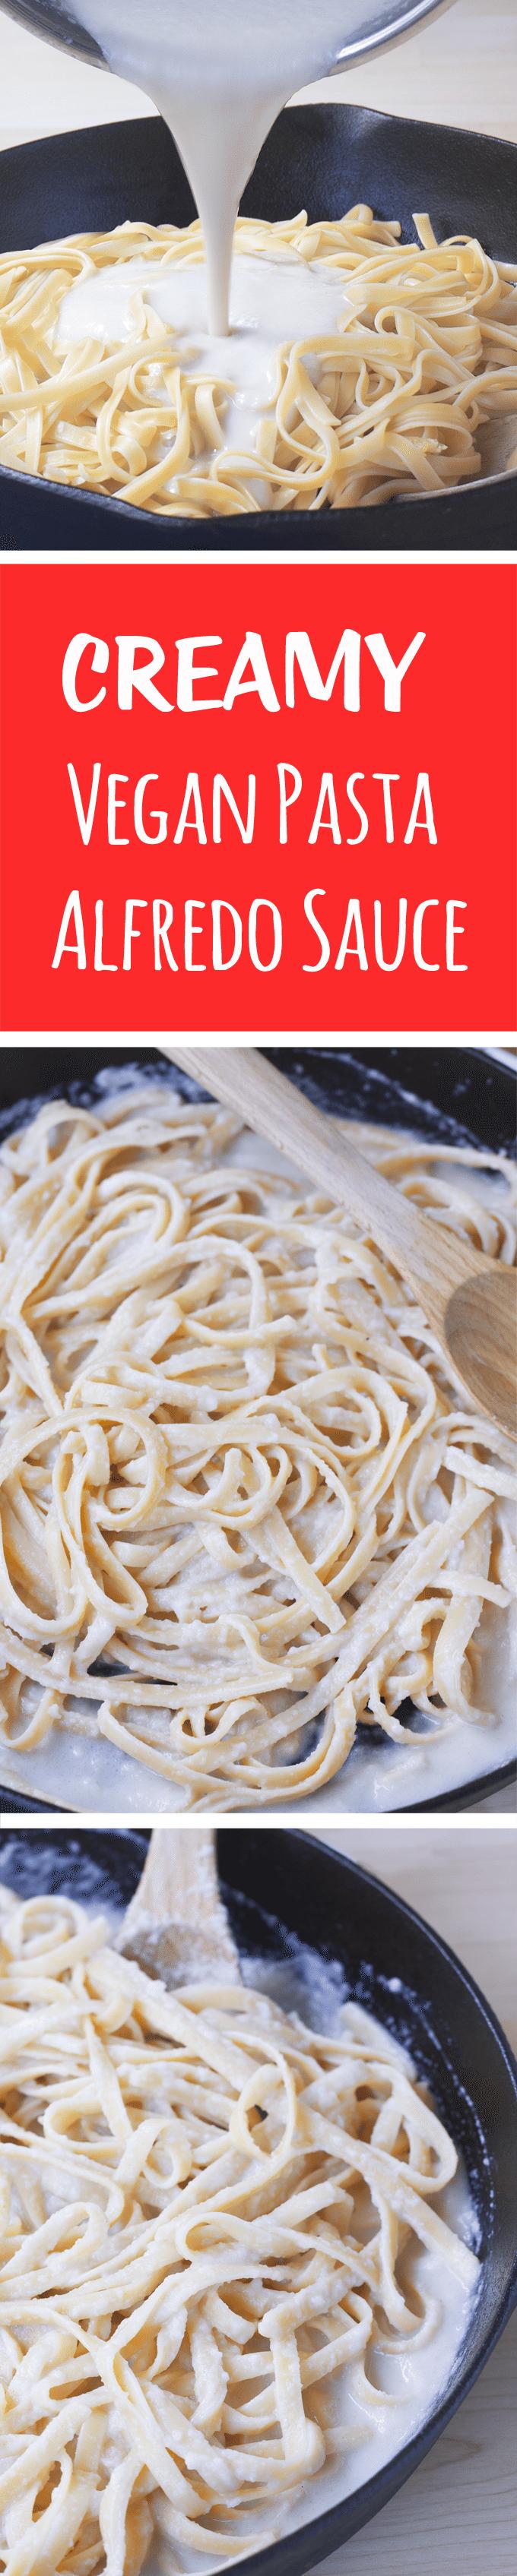 Vegan Pasta Alfredo - Ingredients: 2 cups cauliflower, 2 tsp garlic, 1/4 tsp salt, 1 1/2 cup... Full recipe: http://chocolatecoveredkatie.com/2016/07/28/vegan-pasta-alfredo-recipe @choccoveredkt